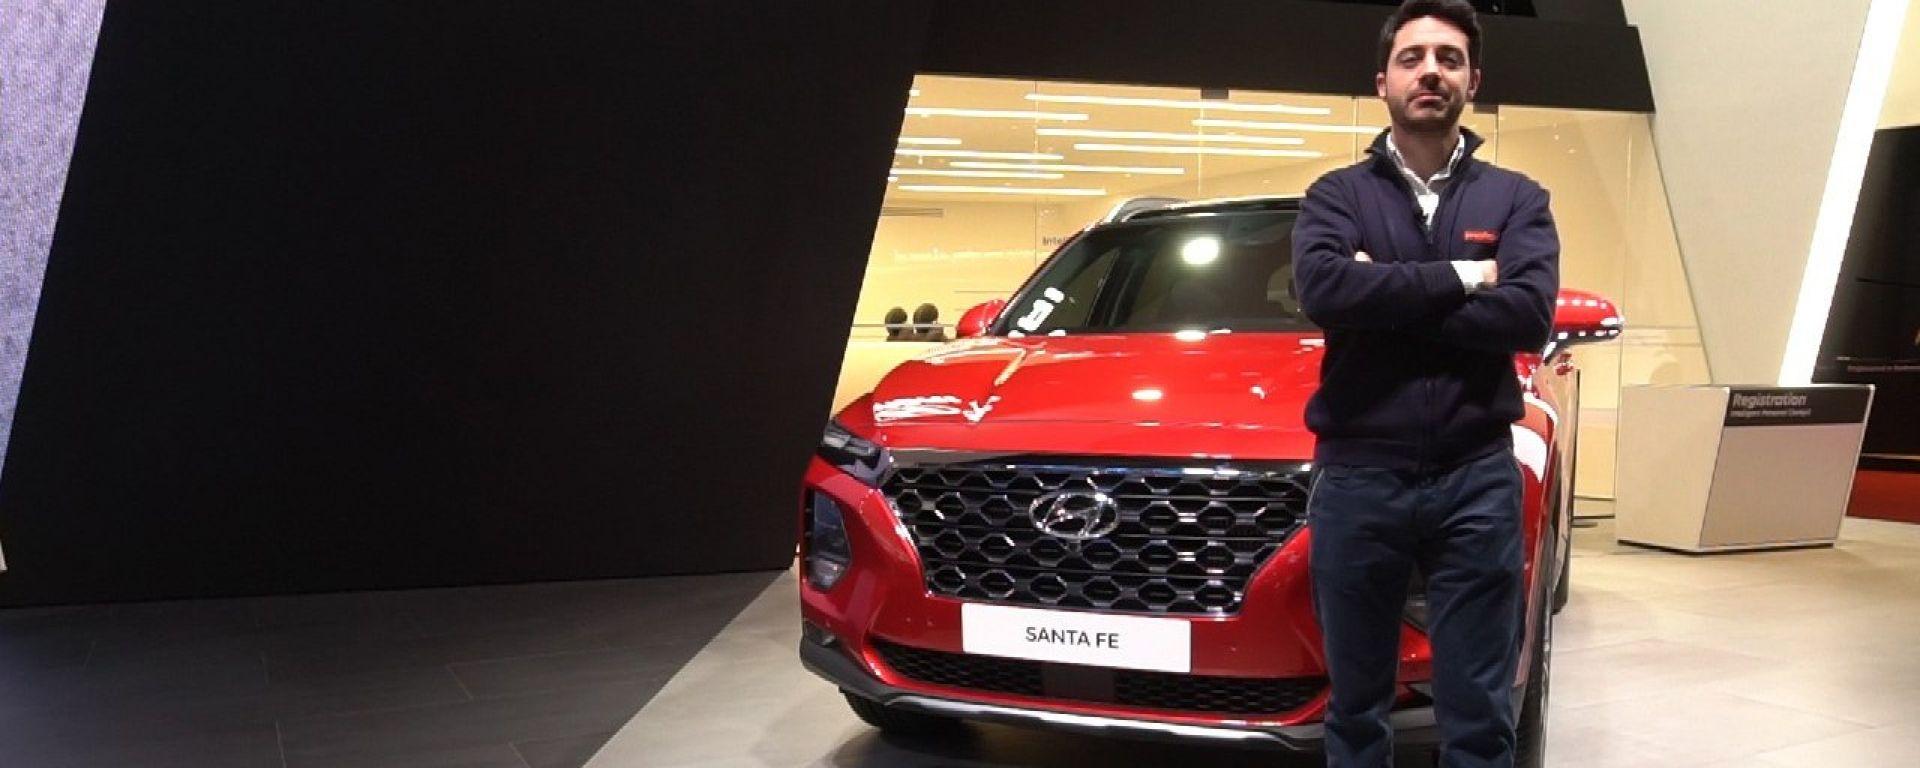 Nuova Hyundai Santa Fe, Live Salone di Ginevra 2018